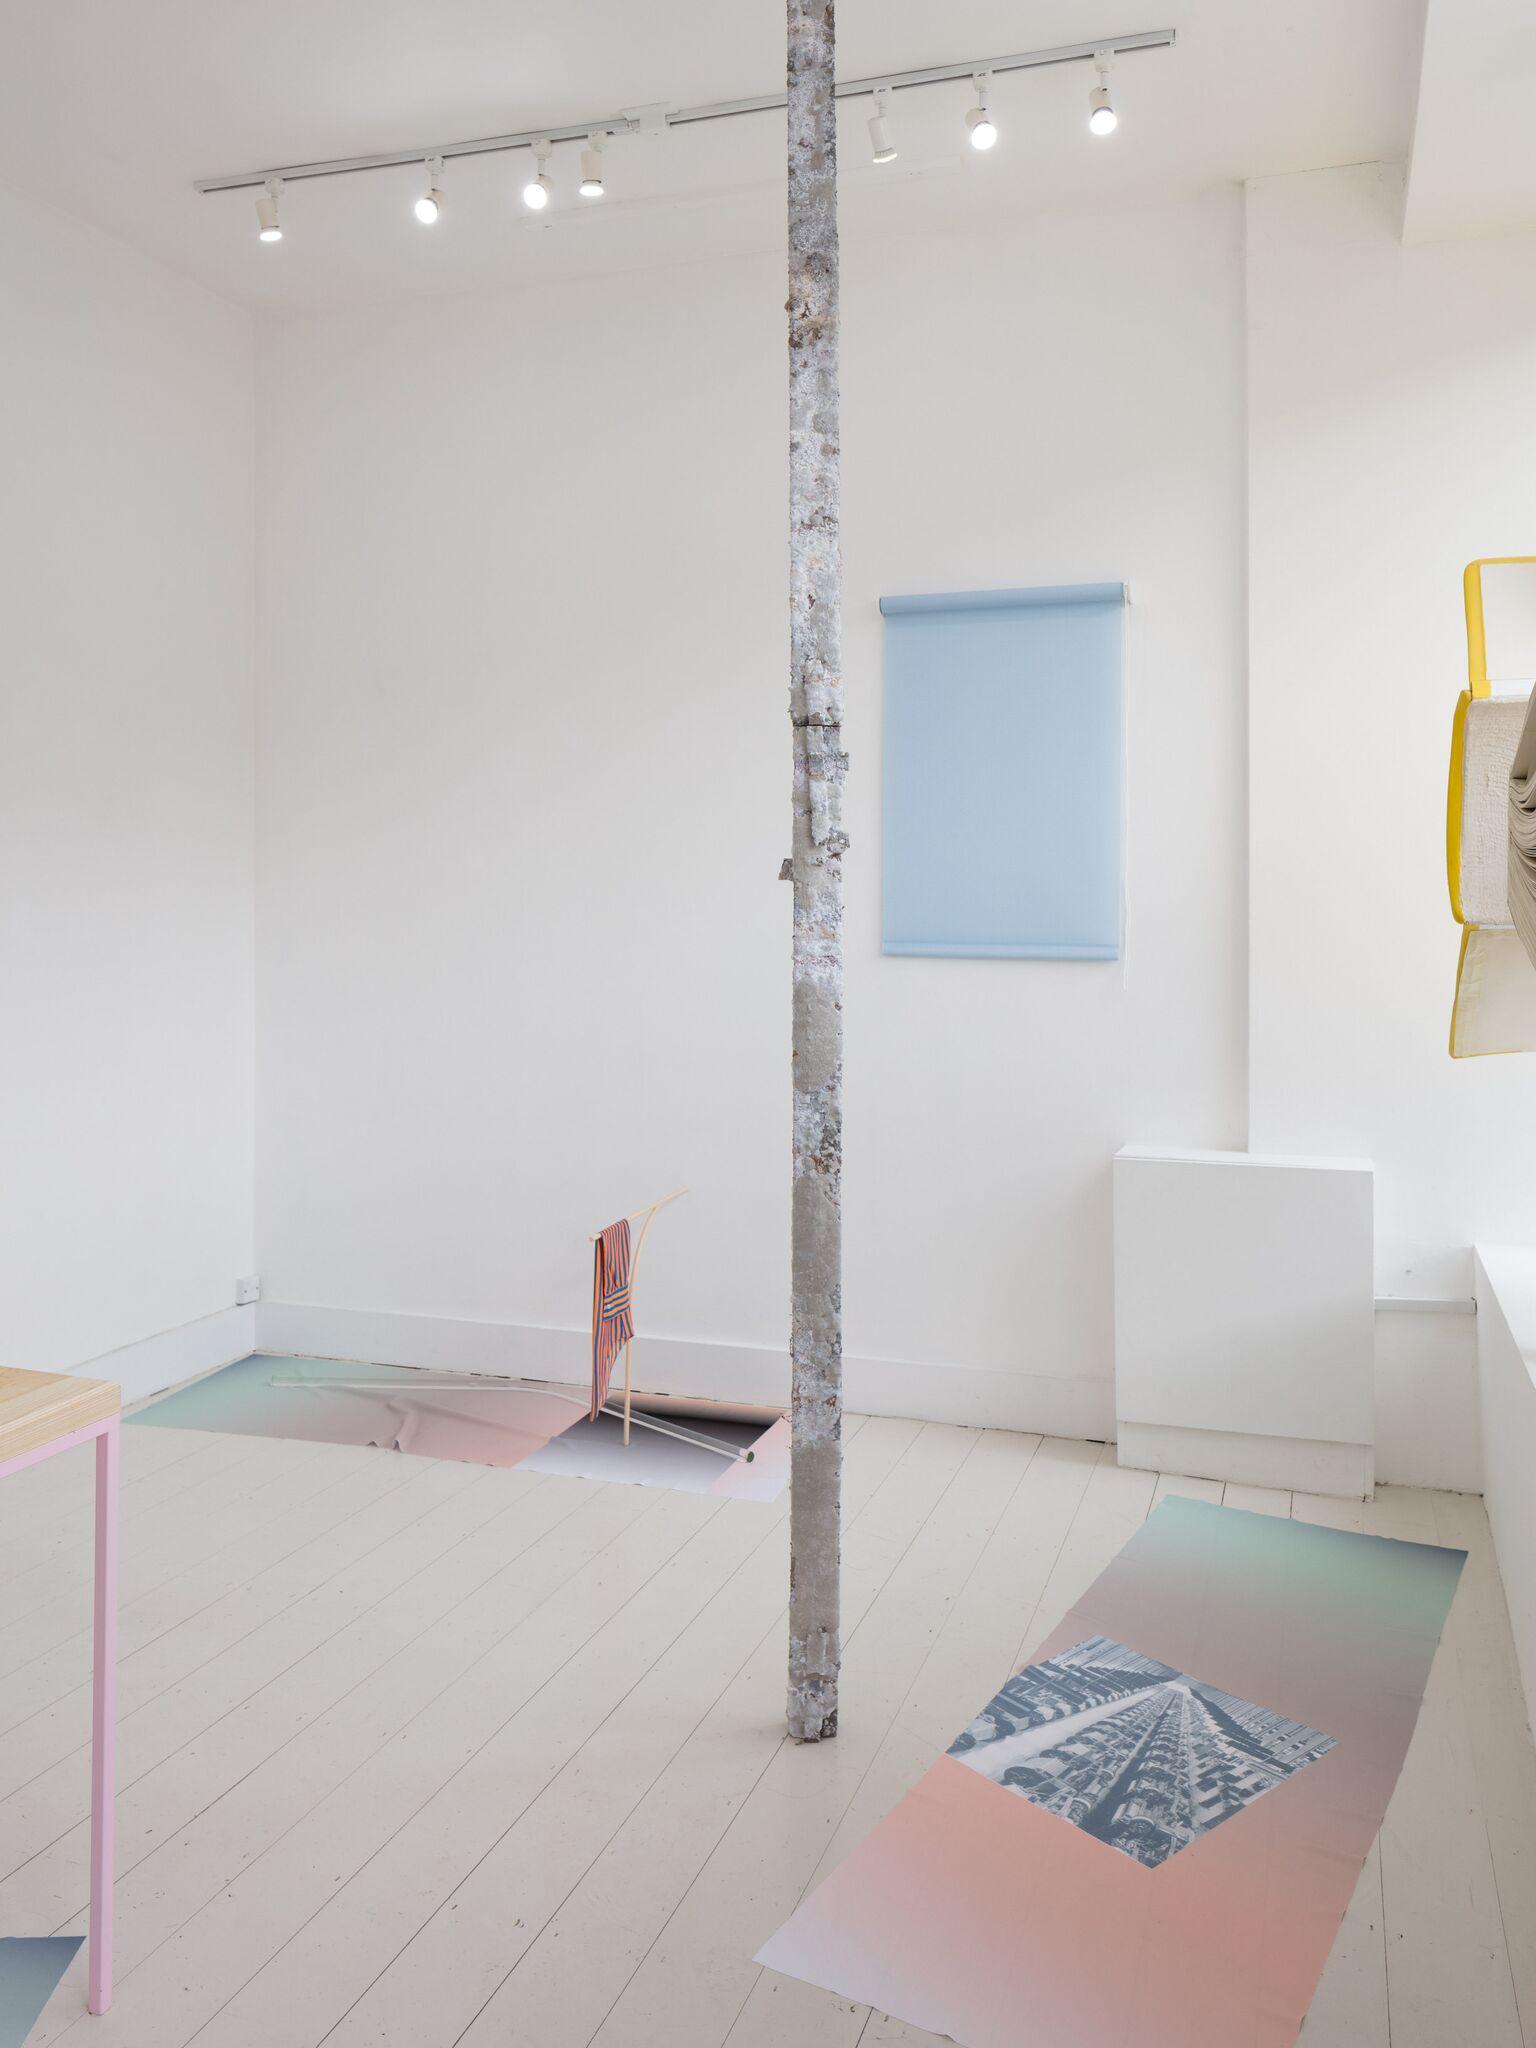 Ben Cain, Passive Imperative Participation Vibe, installation view, 2018. Documentation: Plastiques Photography (Ben Cain - Passive Imperative Participation Vibe 9)